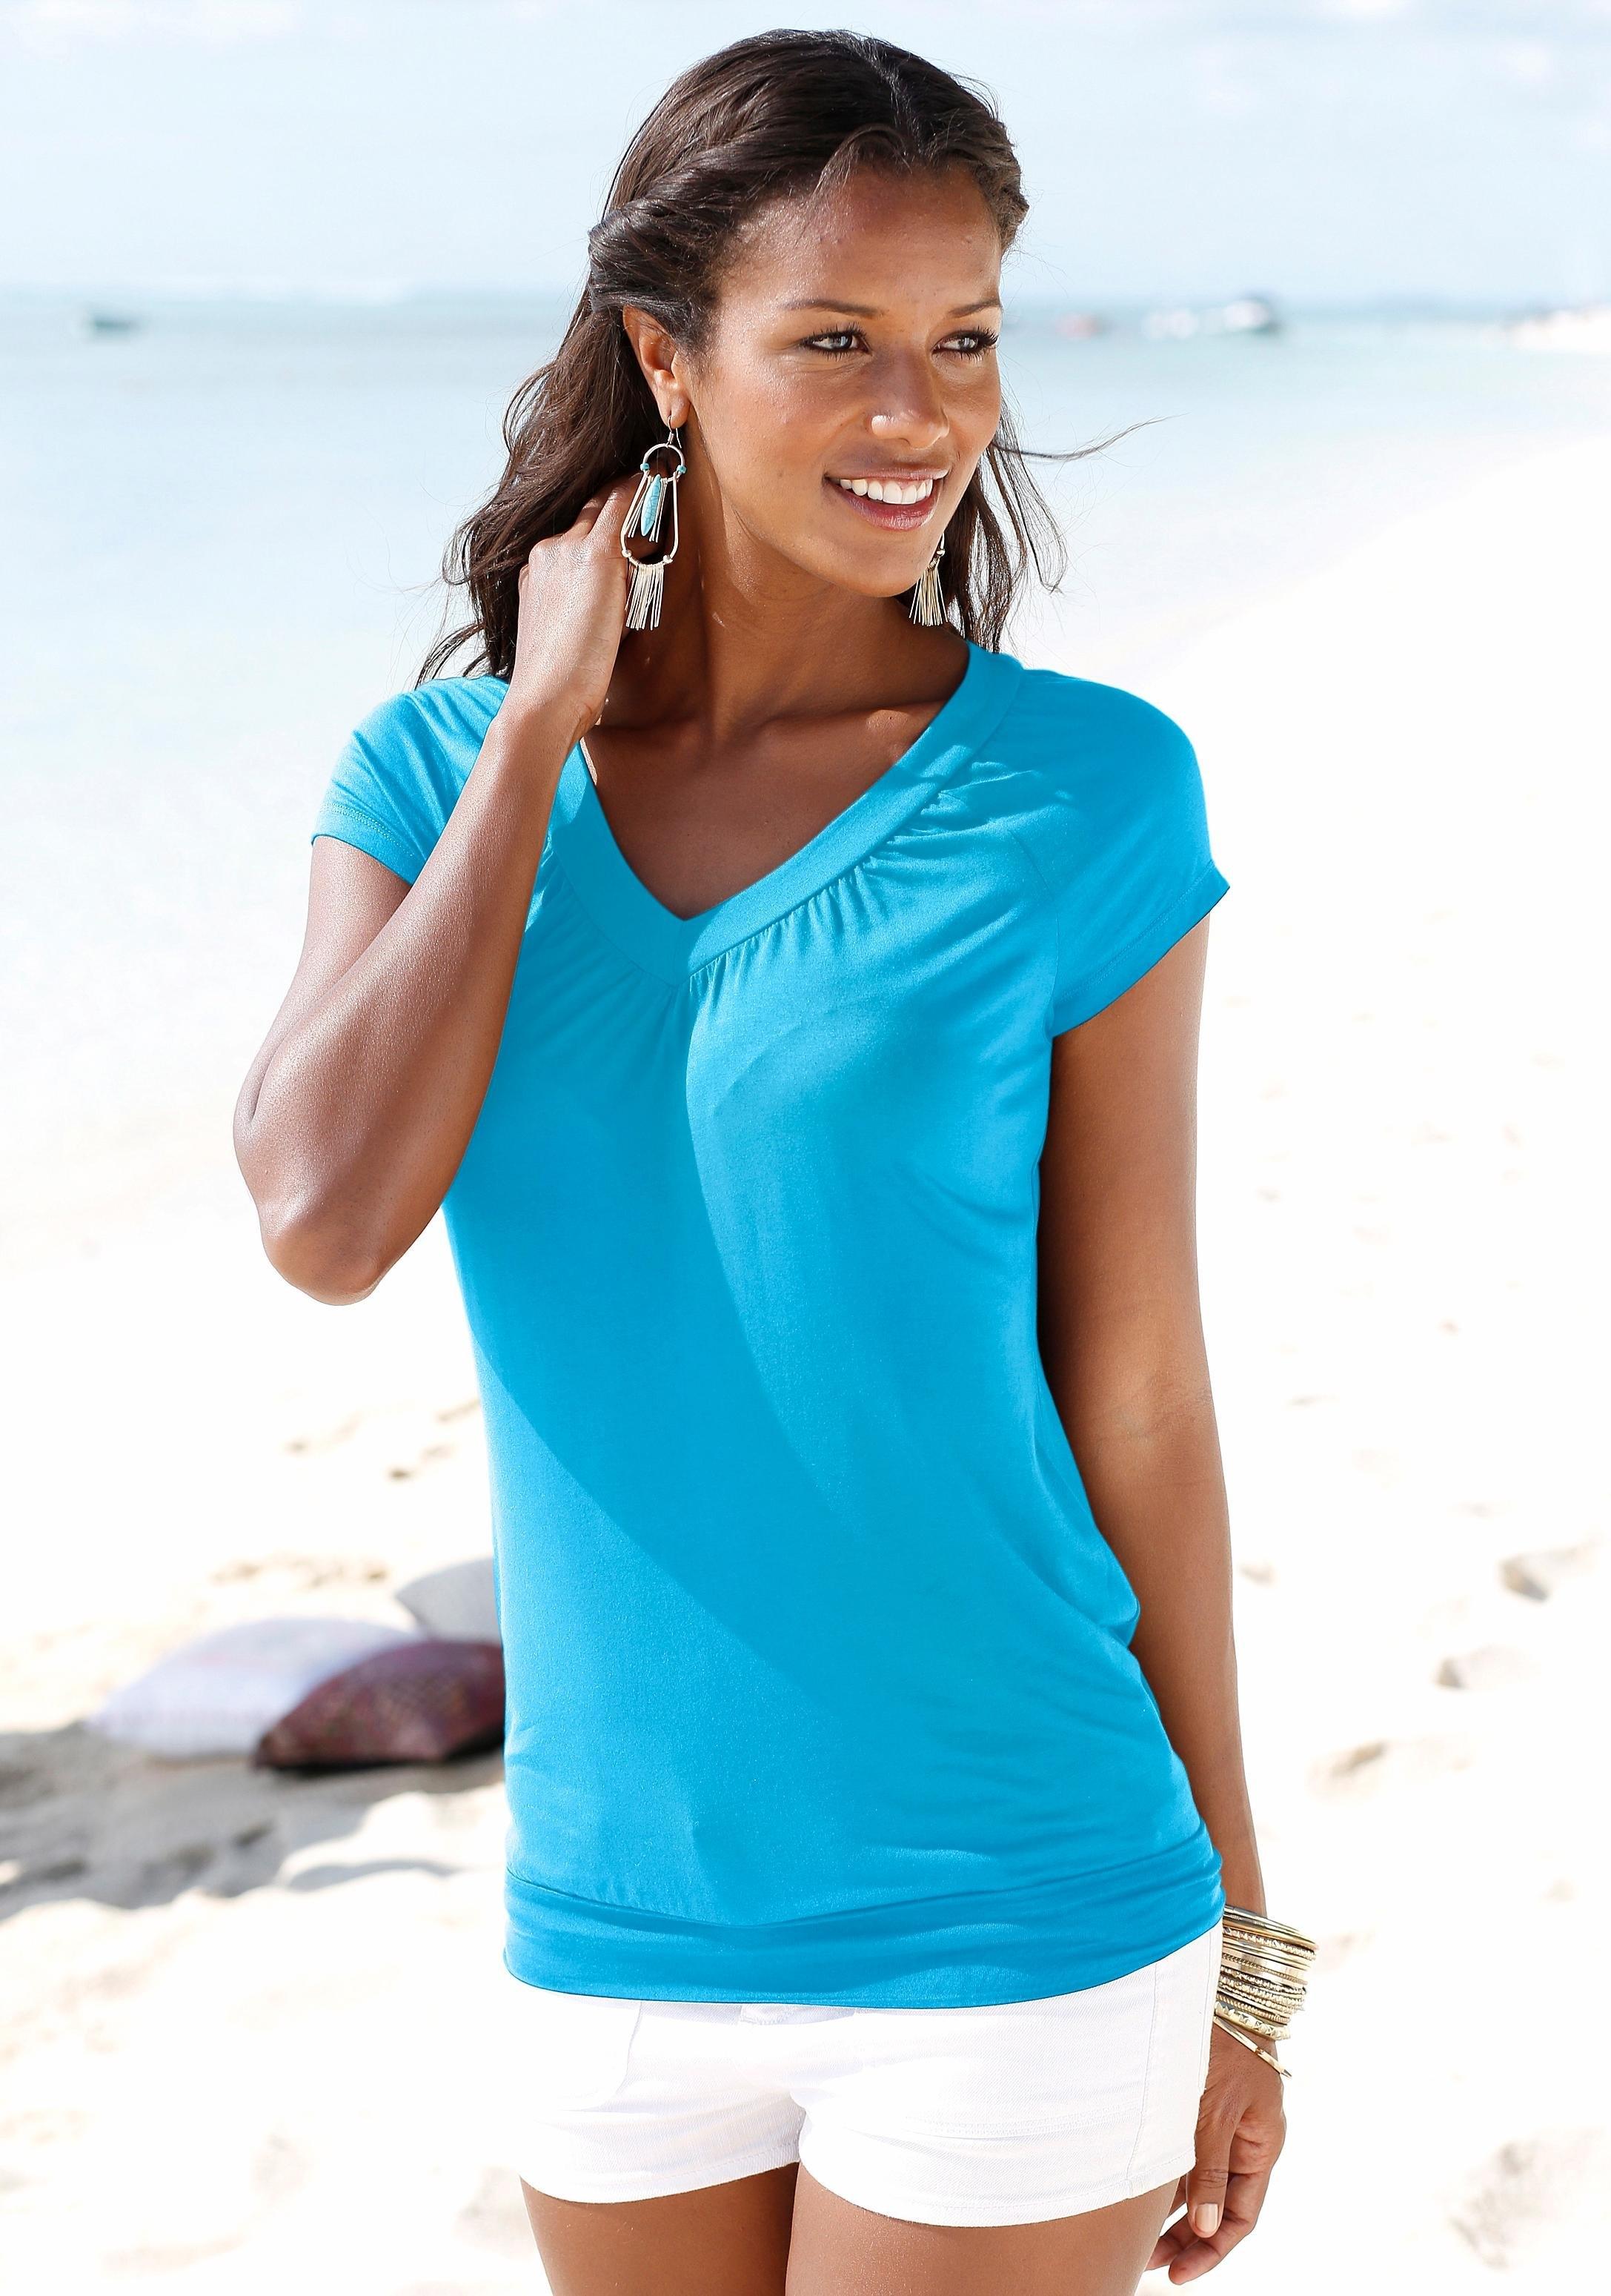 LASCANA shirt met V-hals en brede boord (set van 2) in de webshop van Lascana kopen